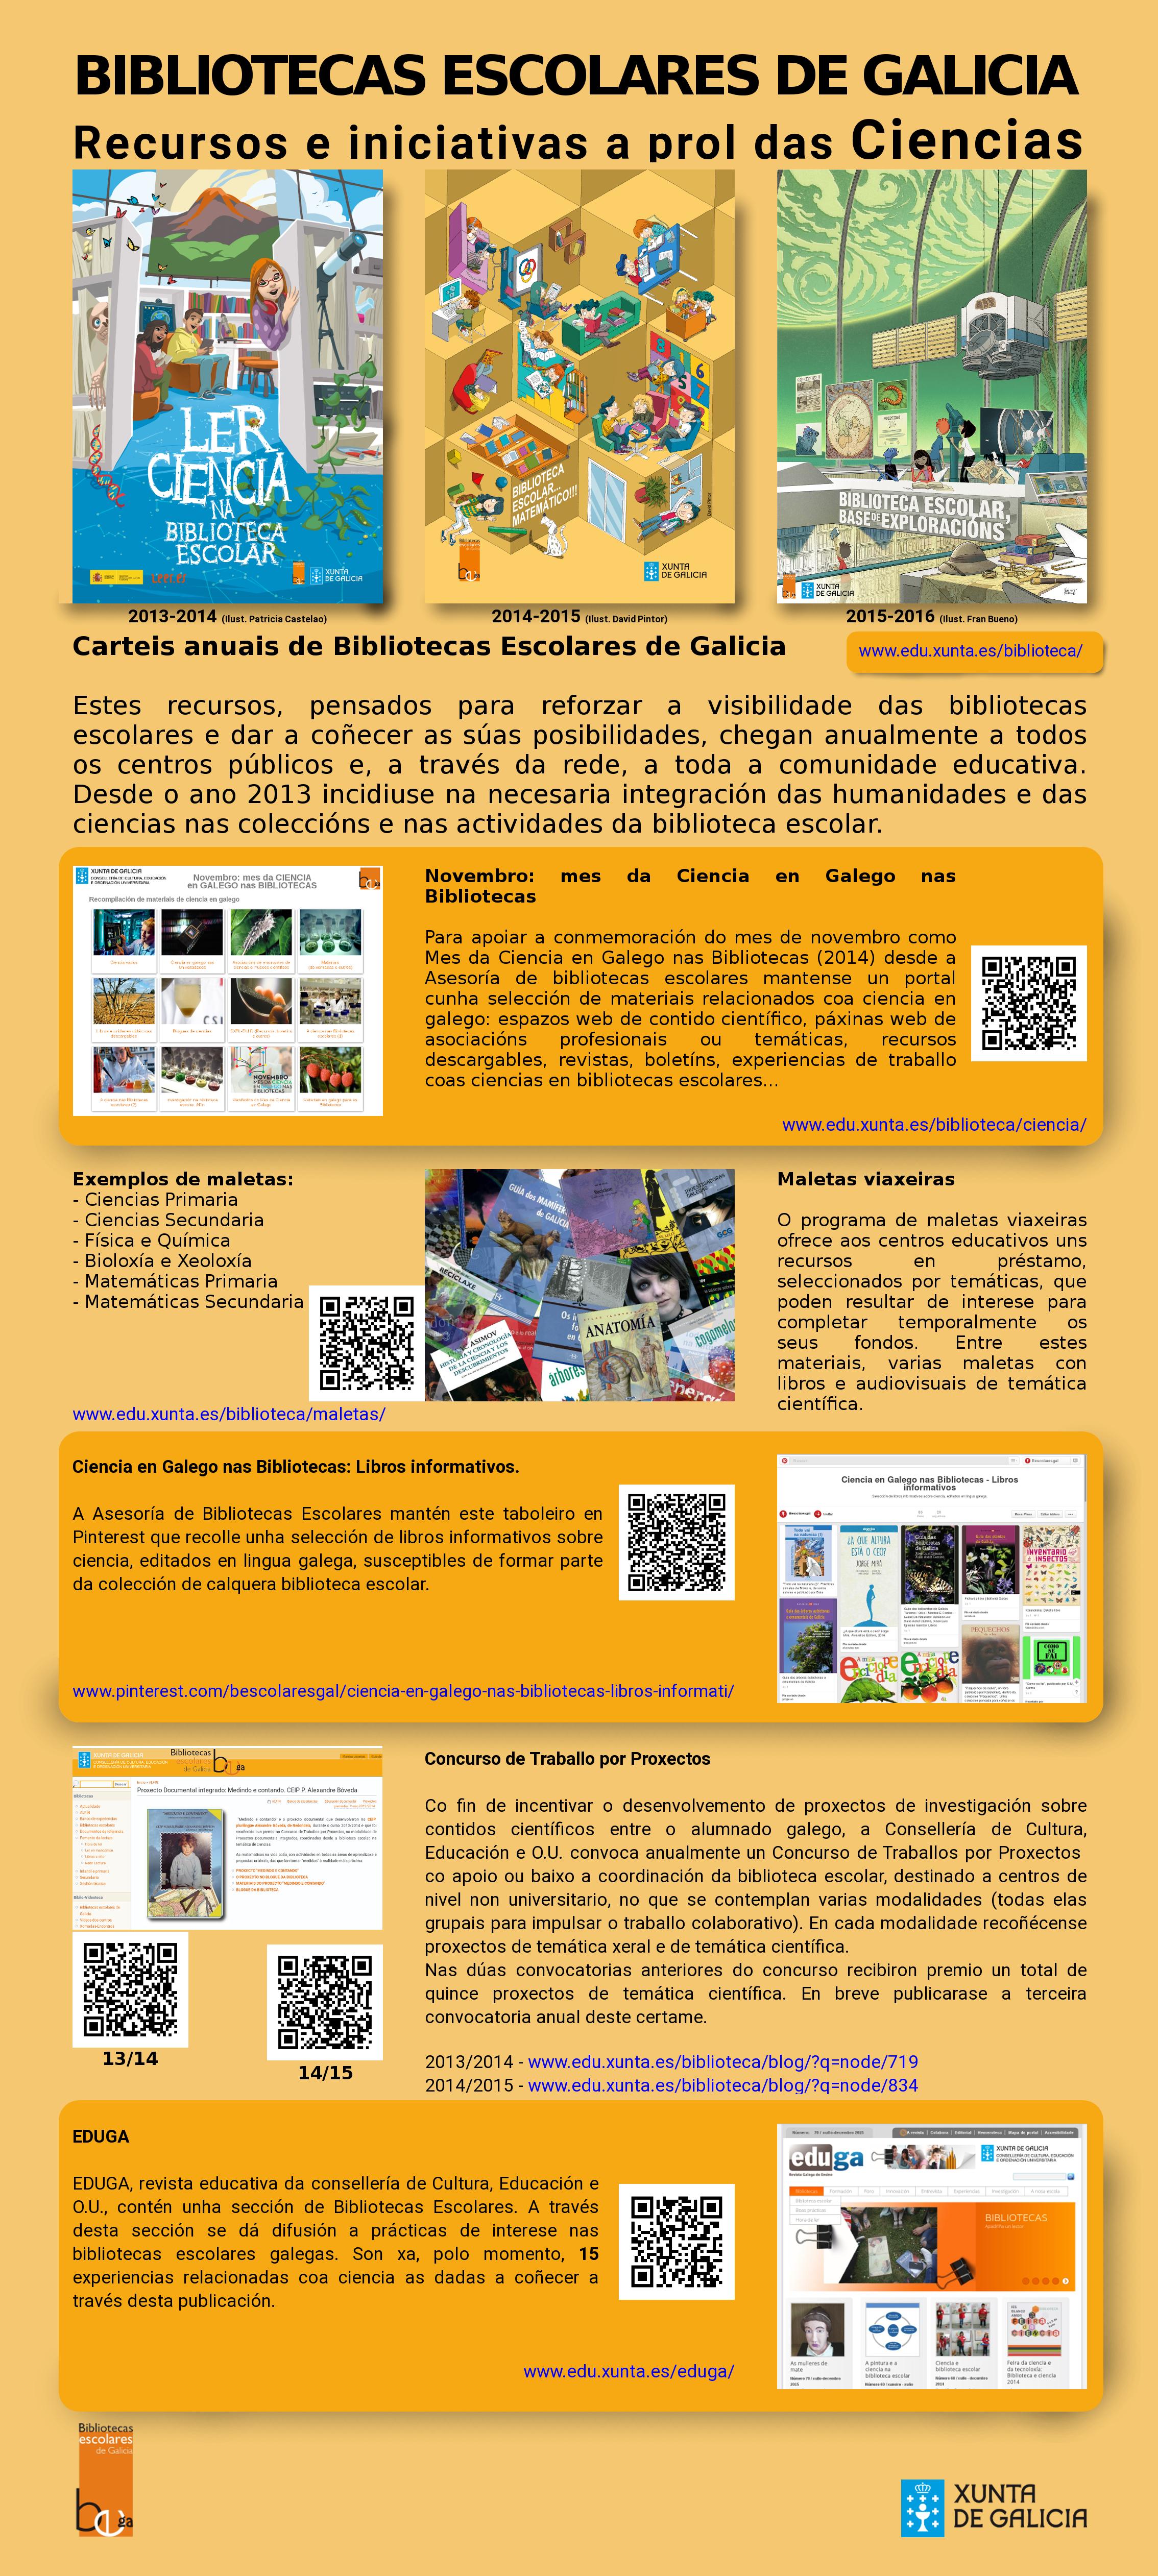 http://www.edu.xunta.es/biblioteca/blog/files/20160405_Ploter_ciencias_v1-2.png